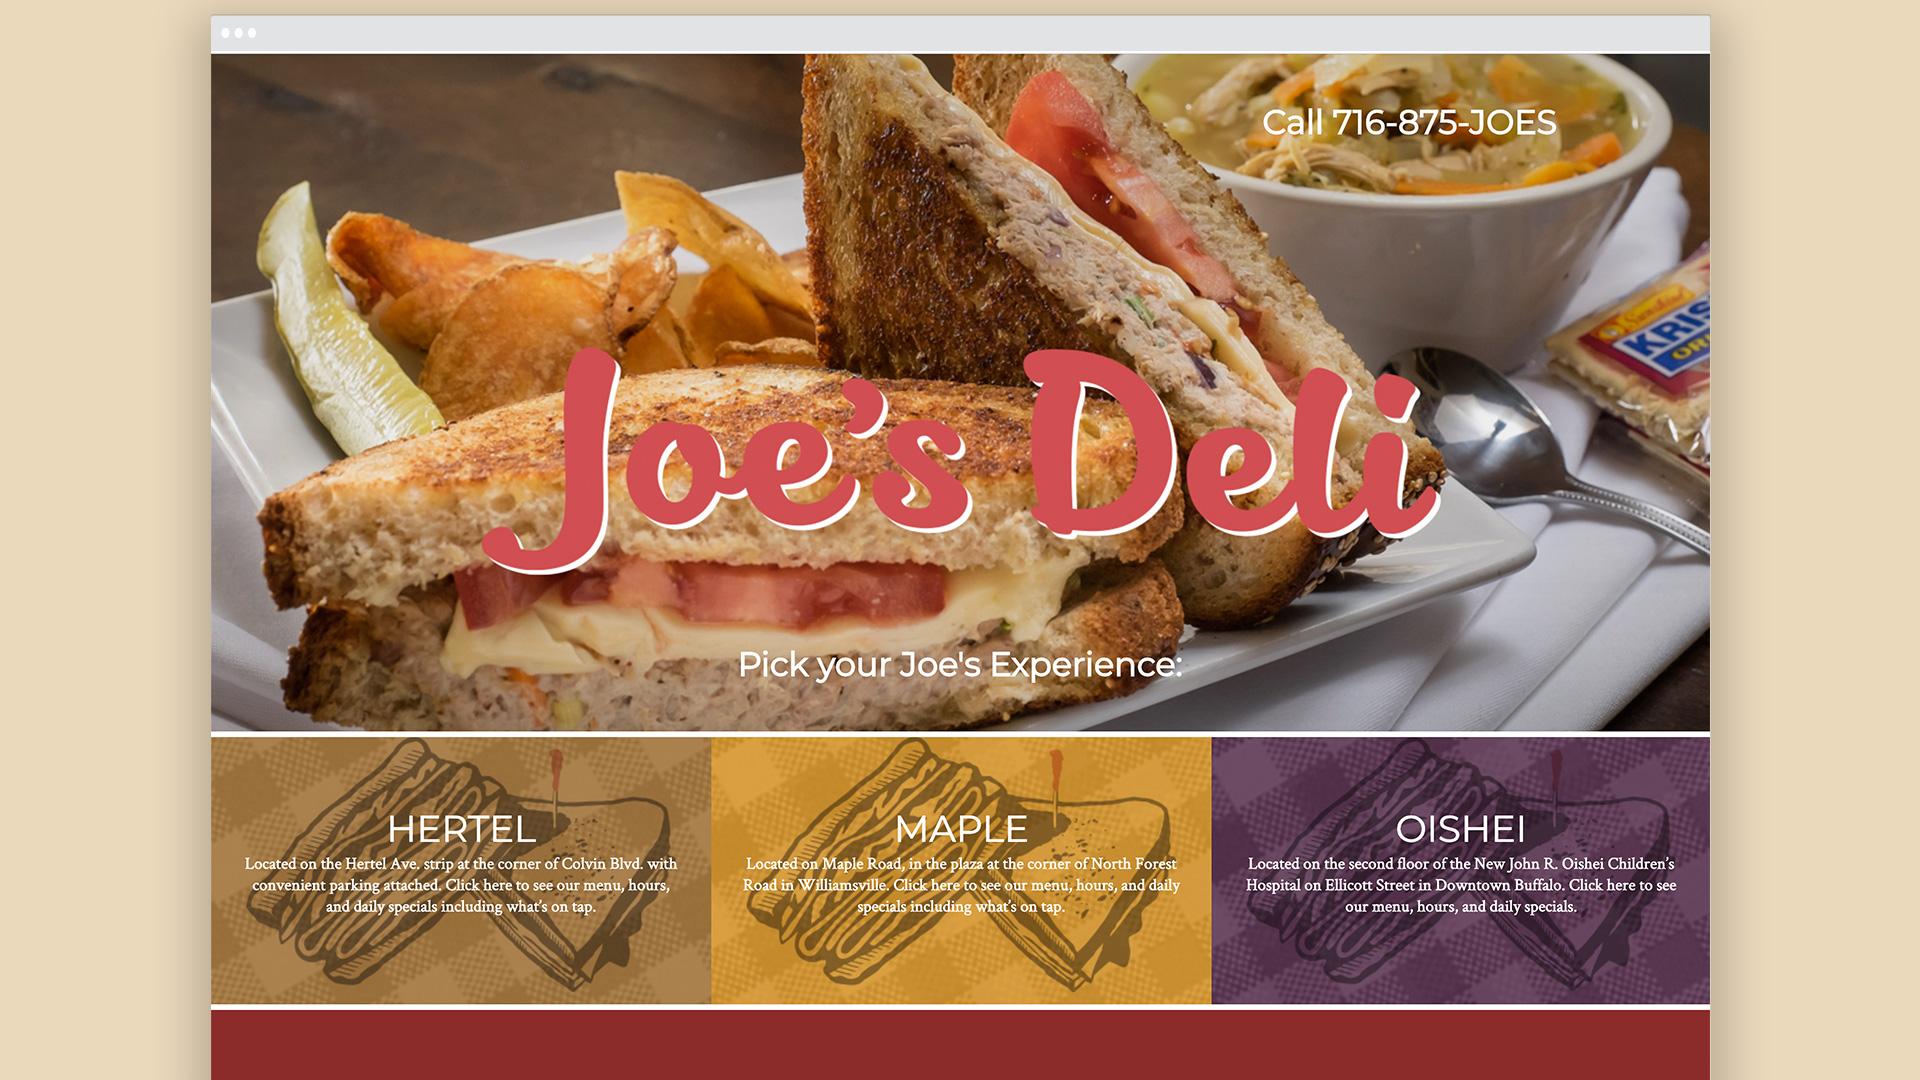 Web design, landing page, Deli, locations, branding